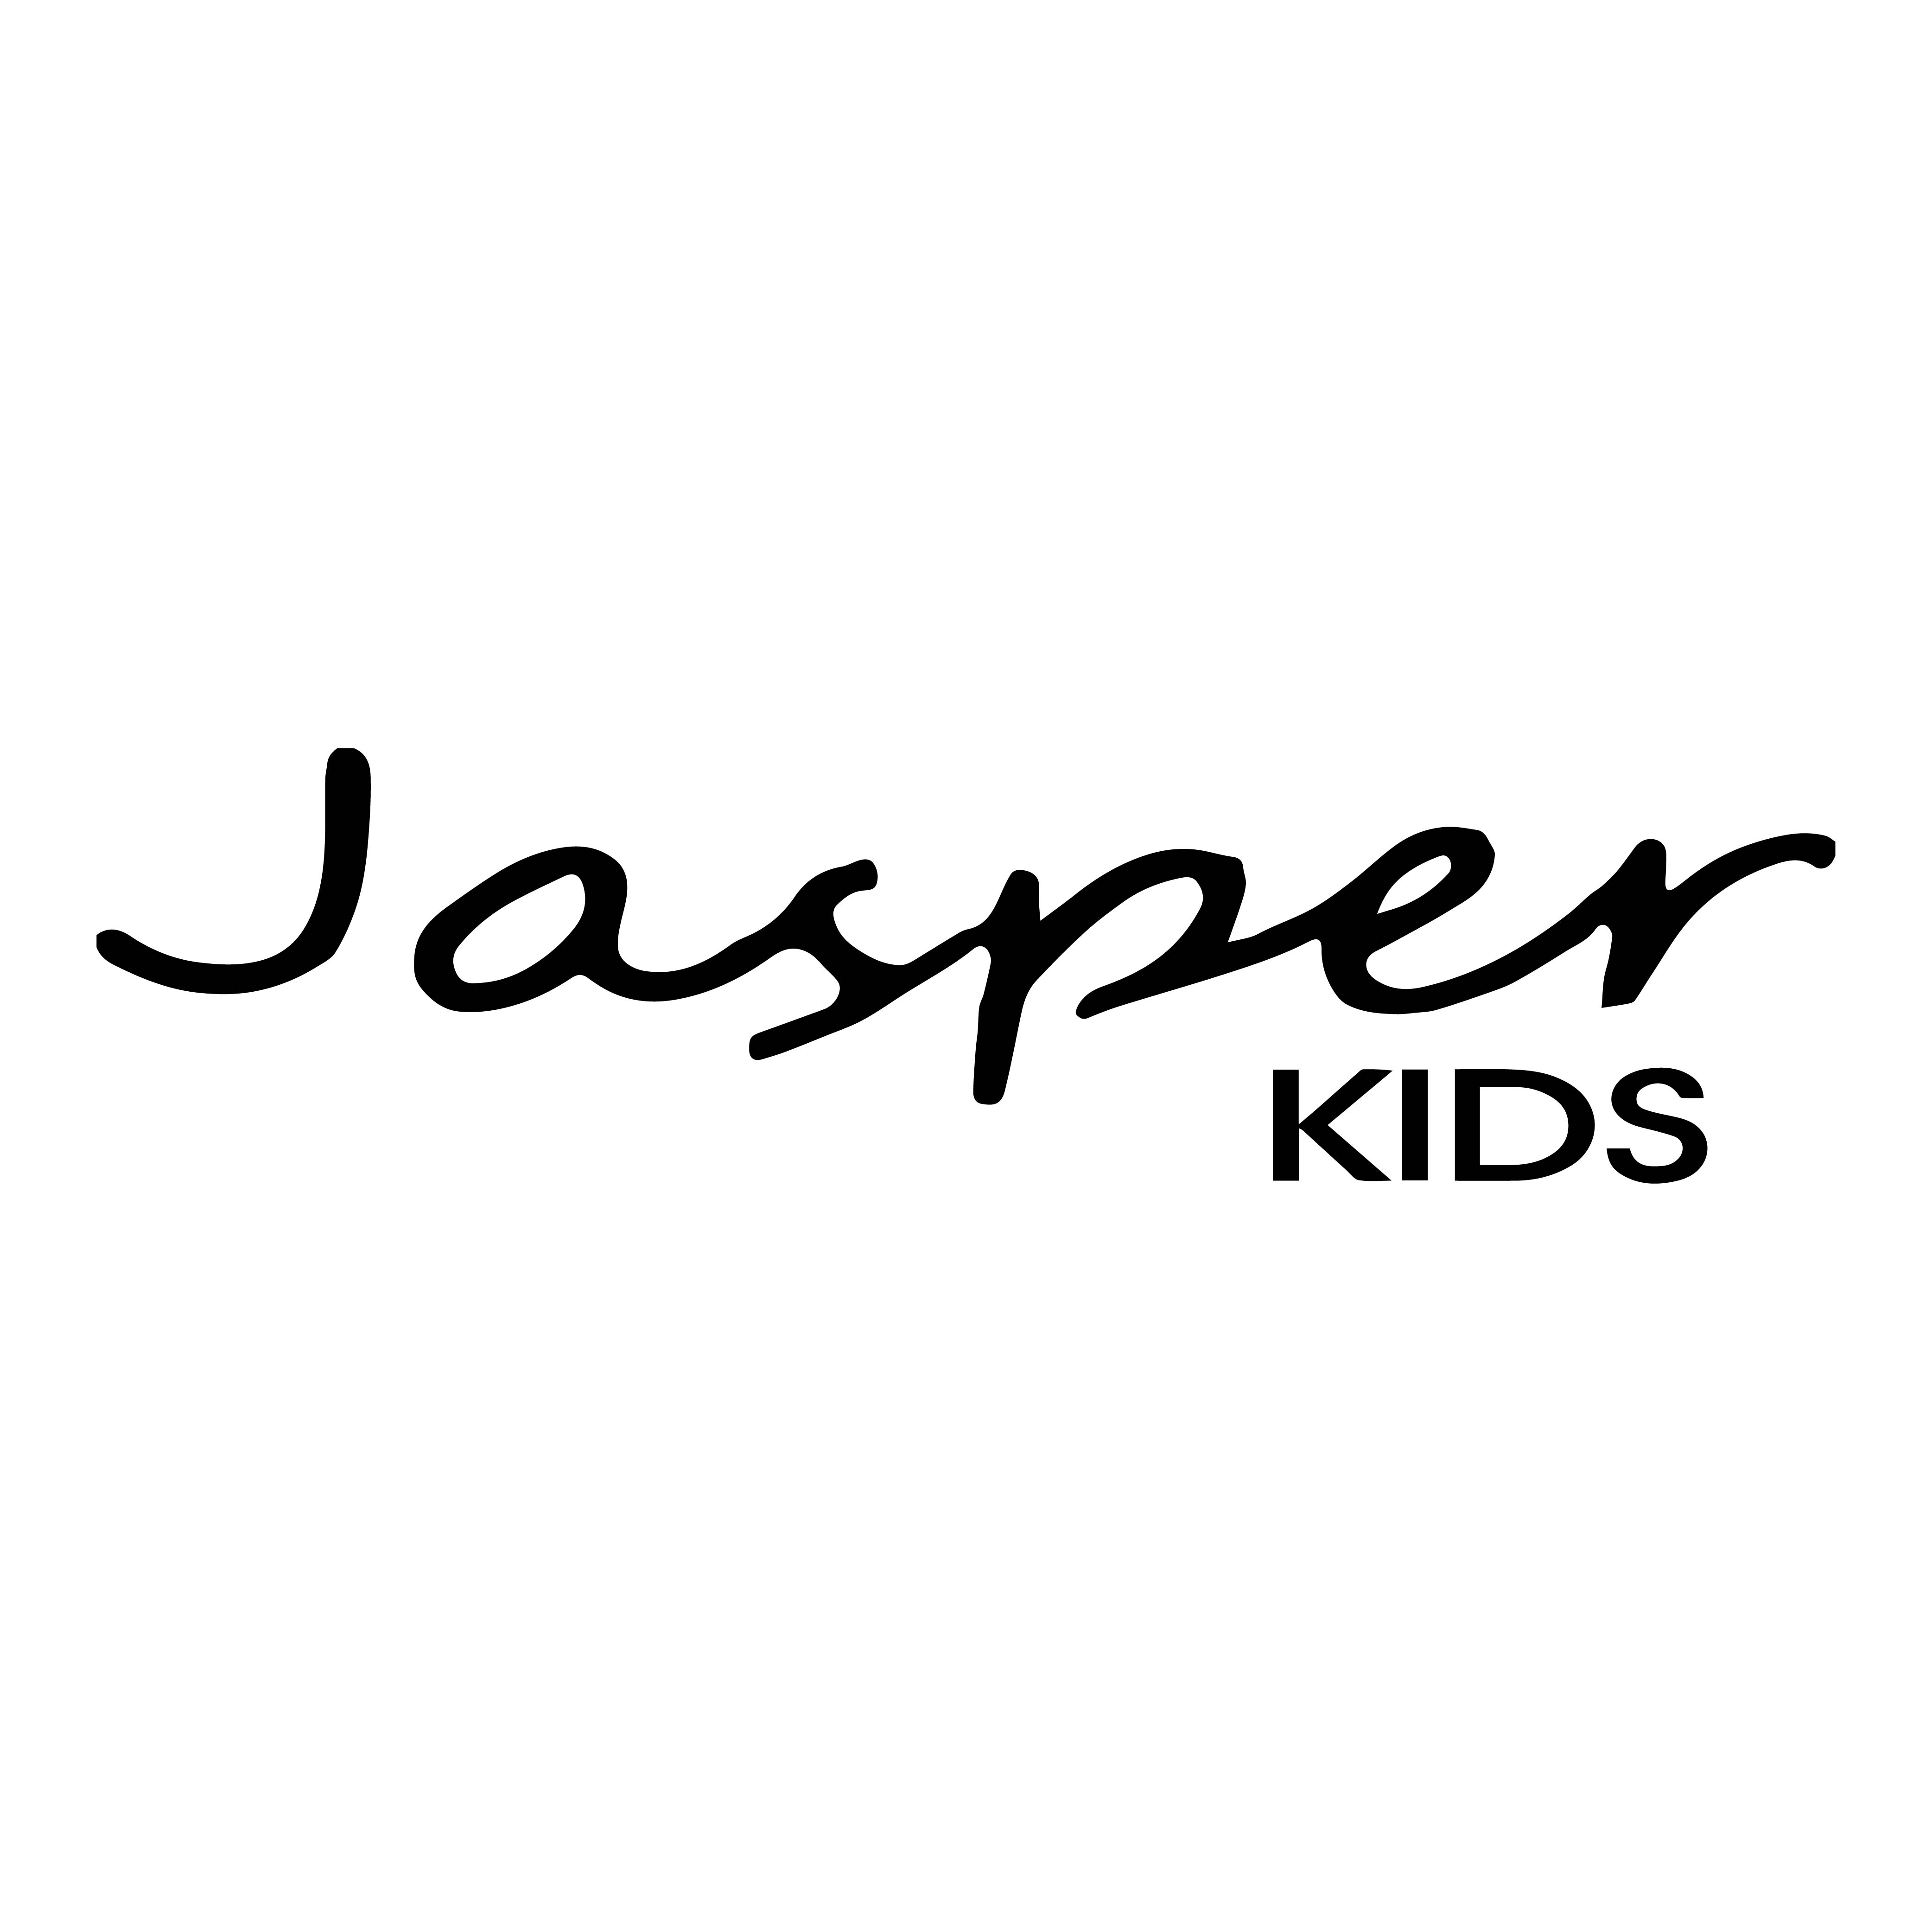 Jasper KIDS